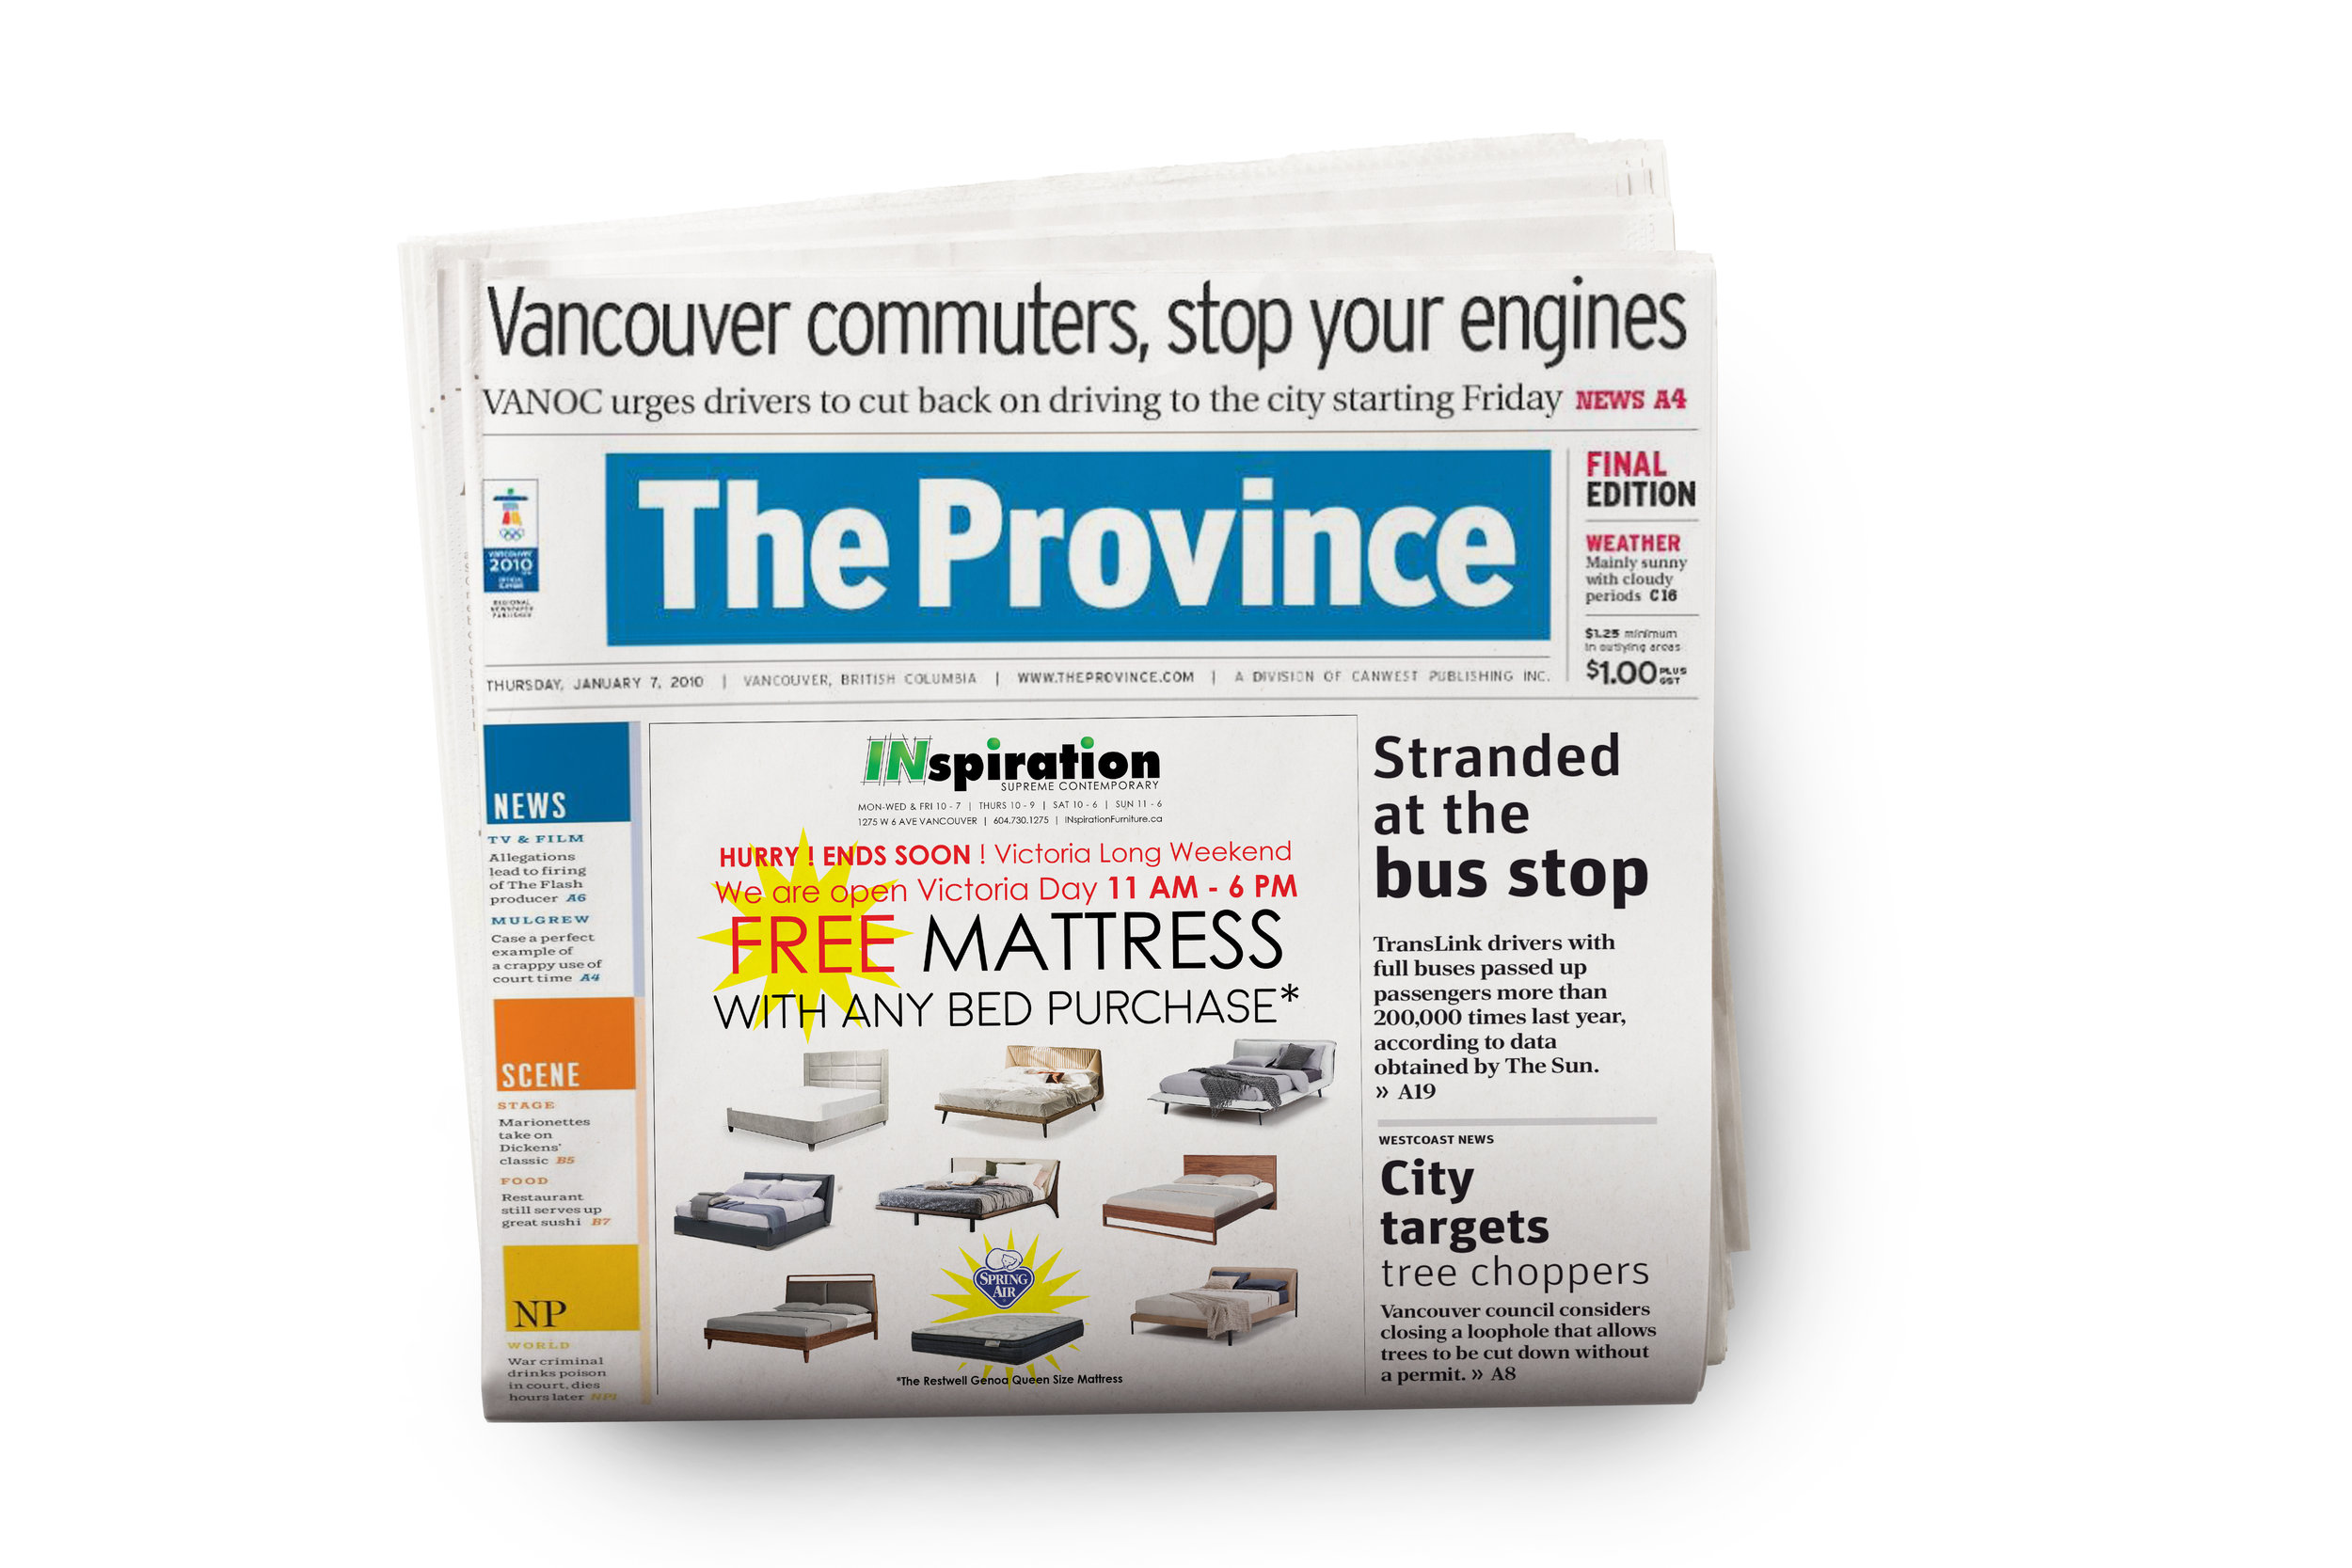 IN_Province_Newspaper11.jpg